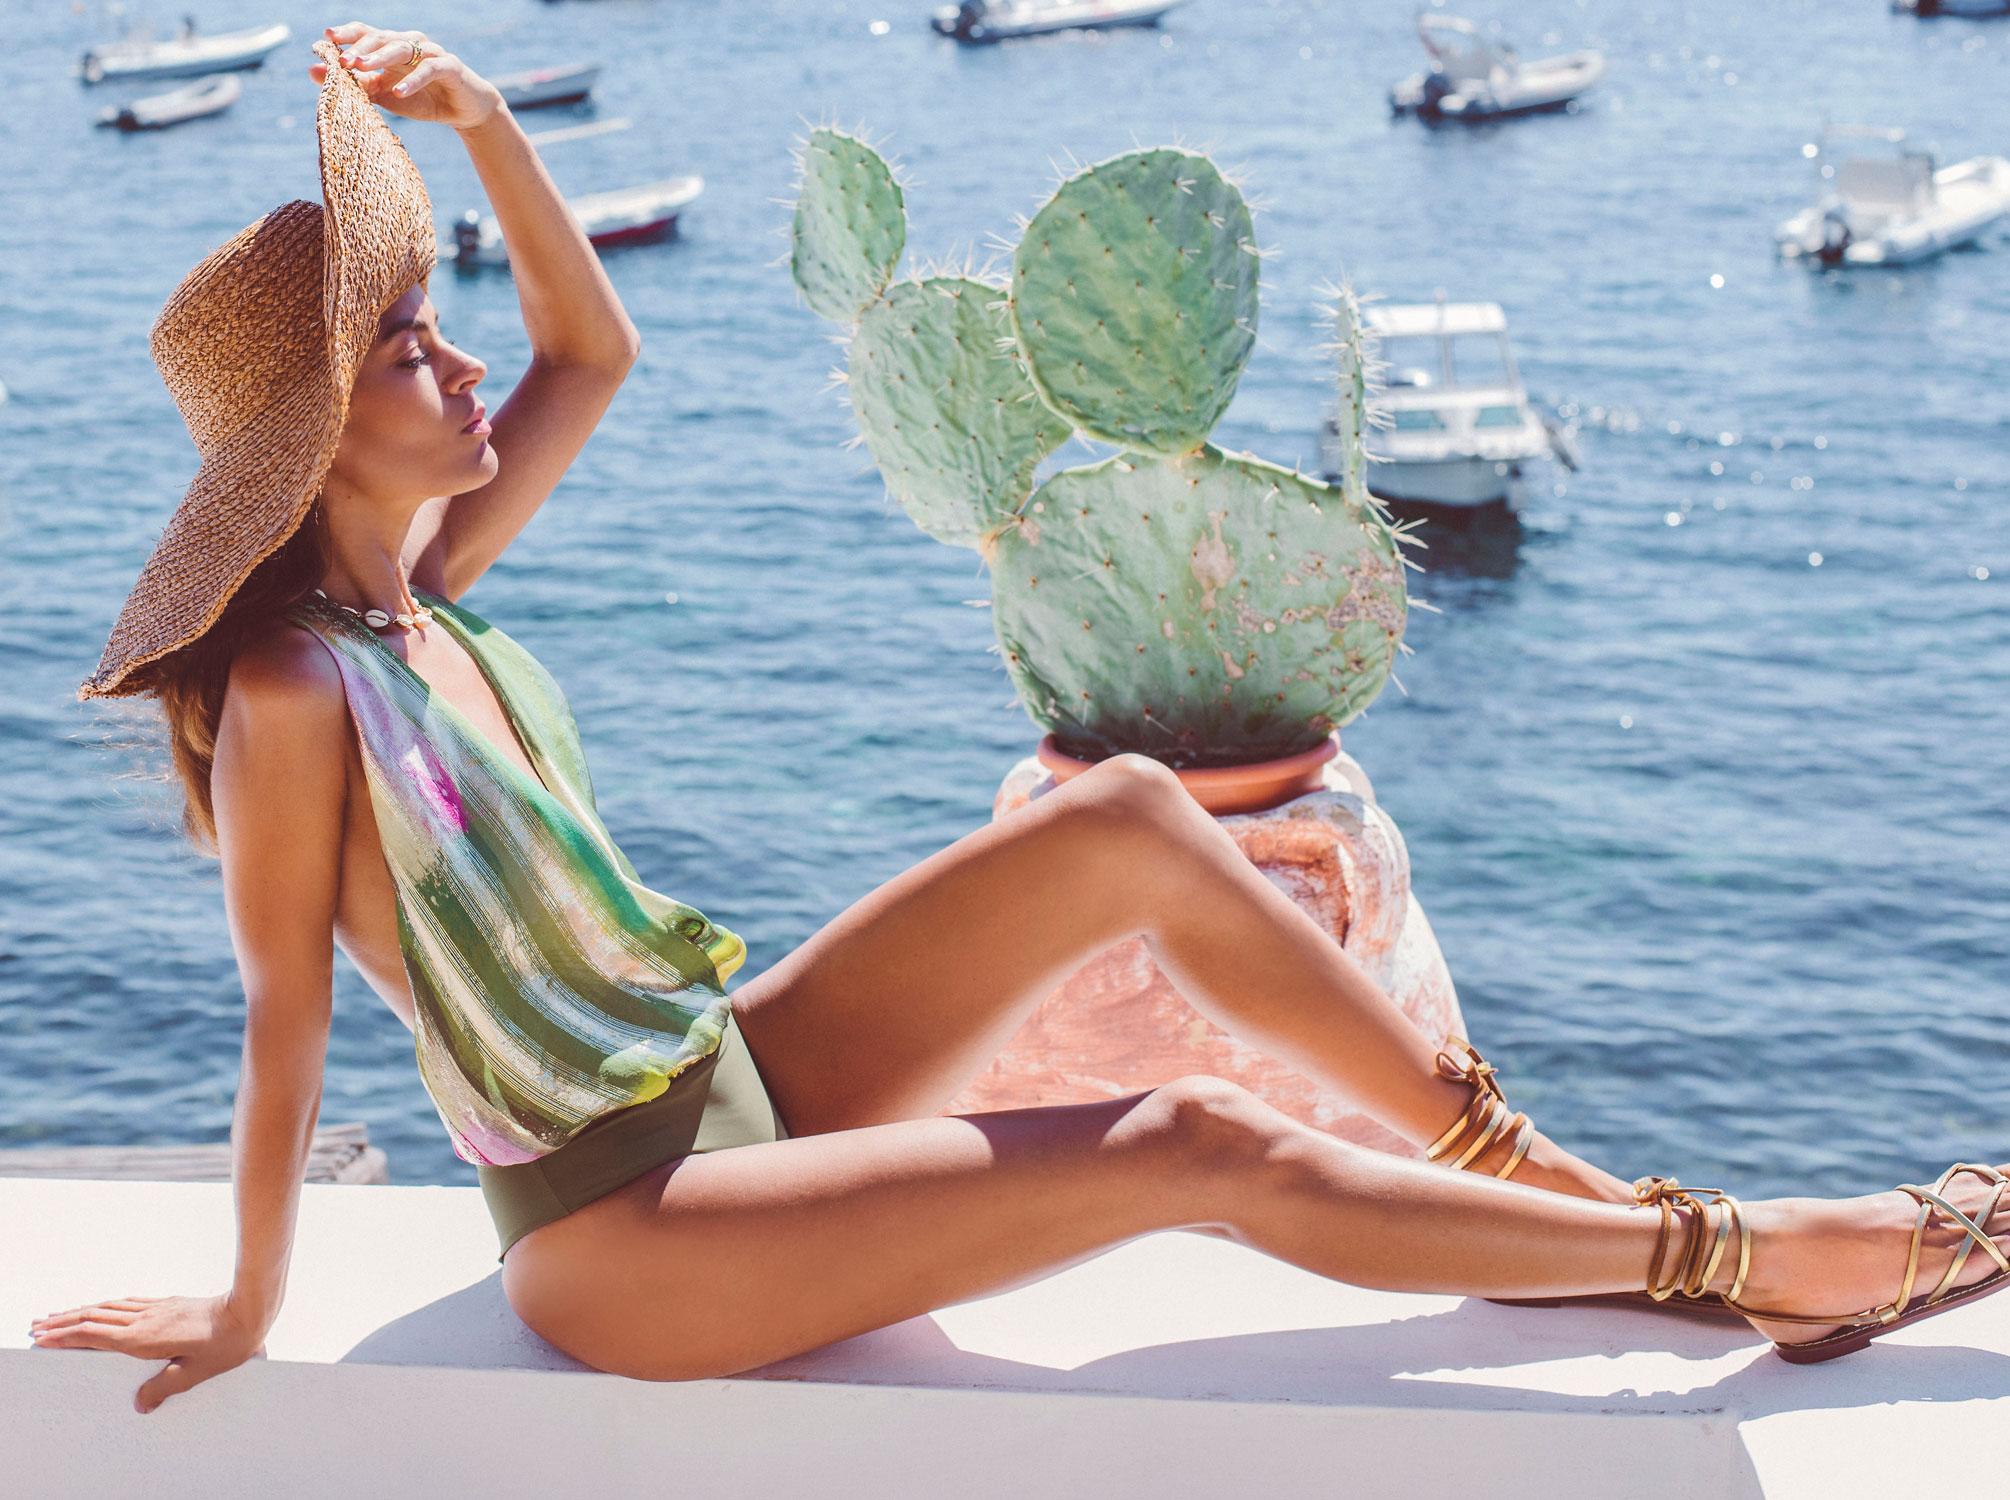 anjuncollection-bikini-lxury-2020-collection-swimwear-summer-swim-suit-made-in-italy